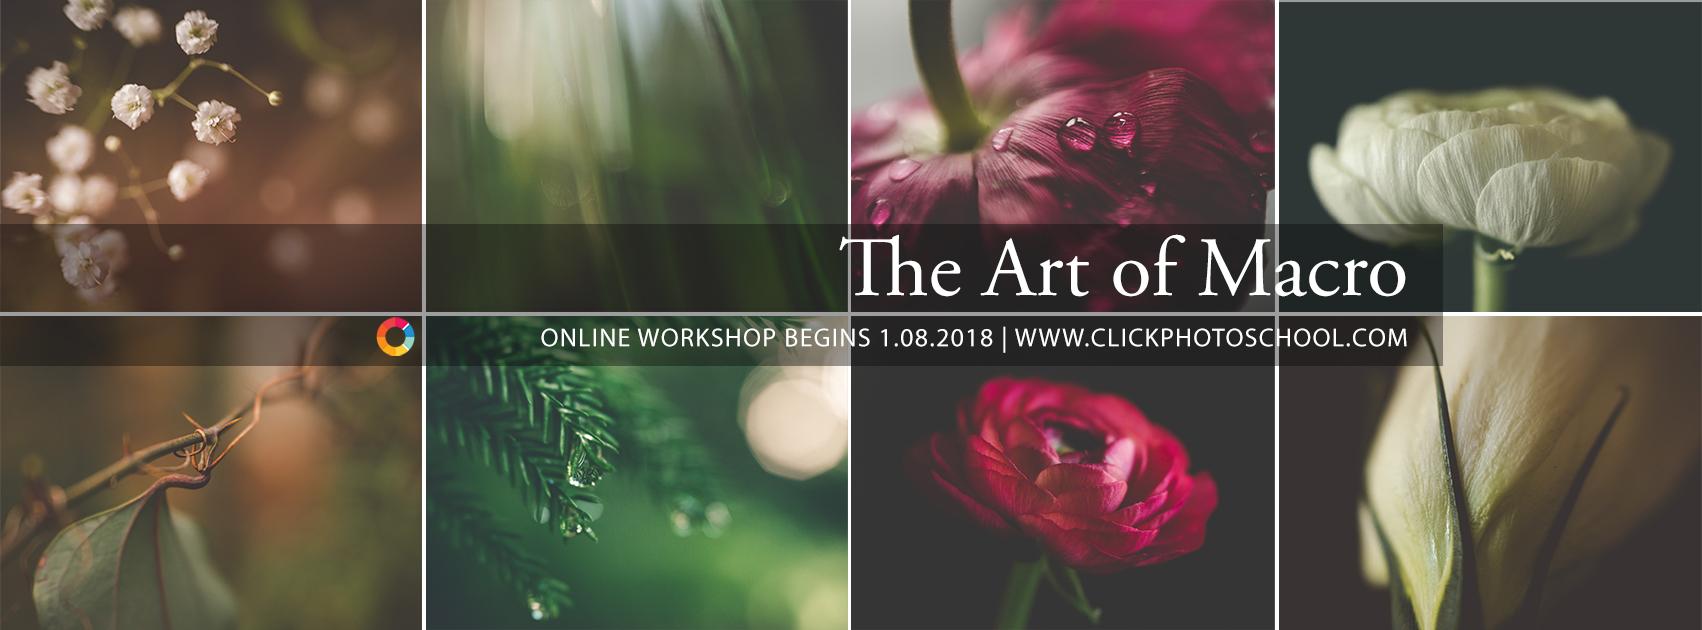 online macro photography workshop